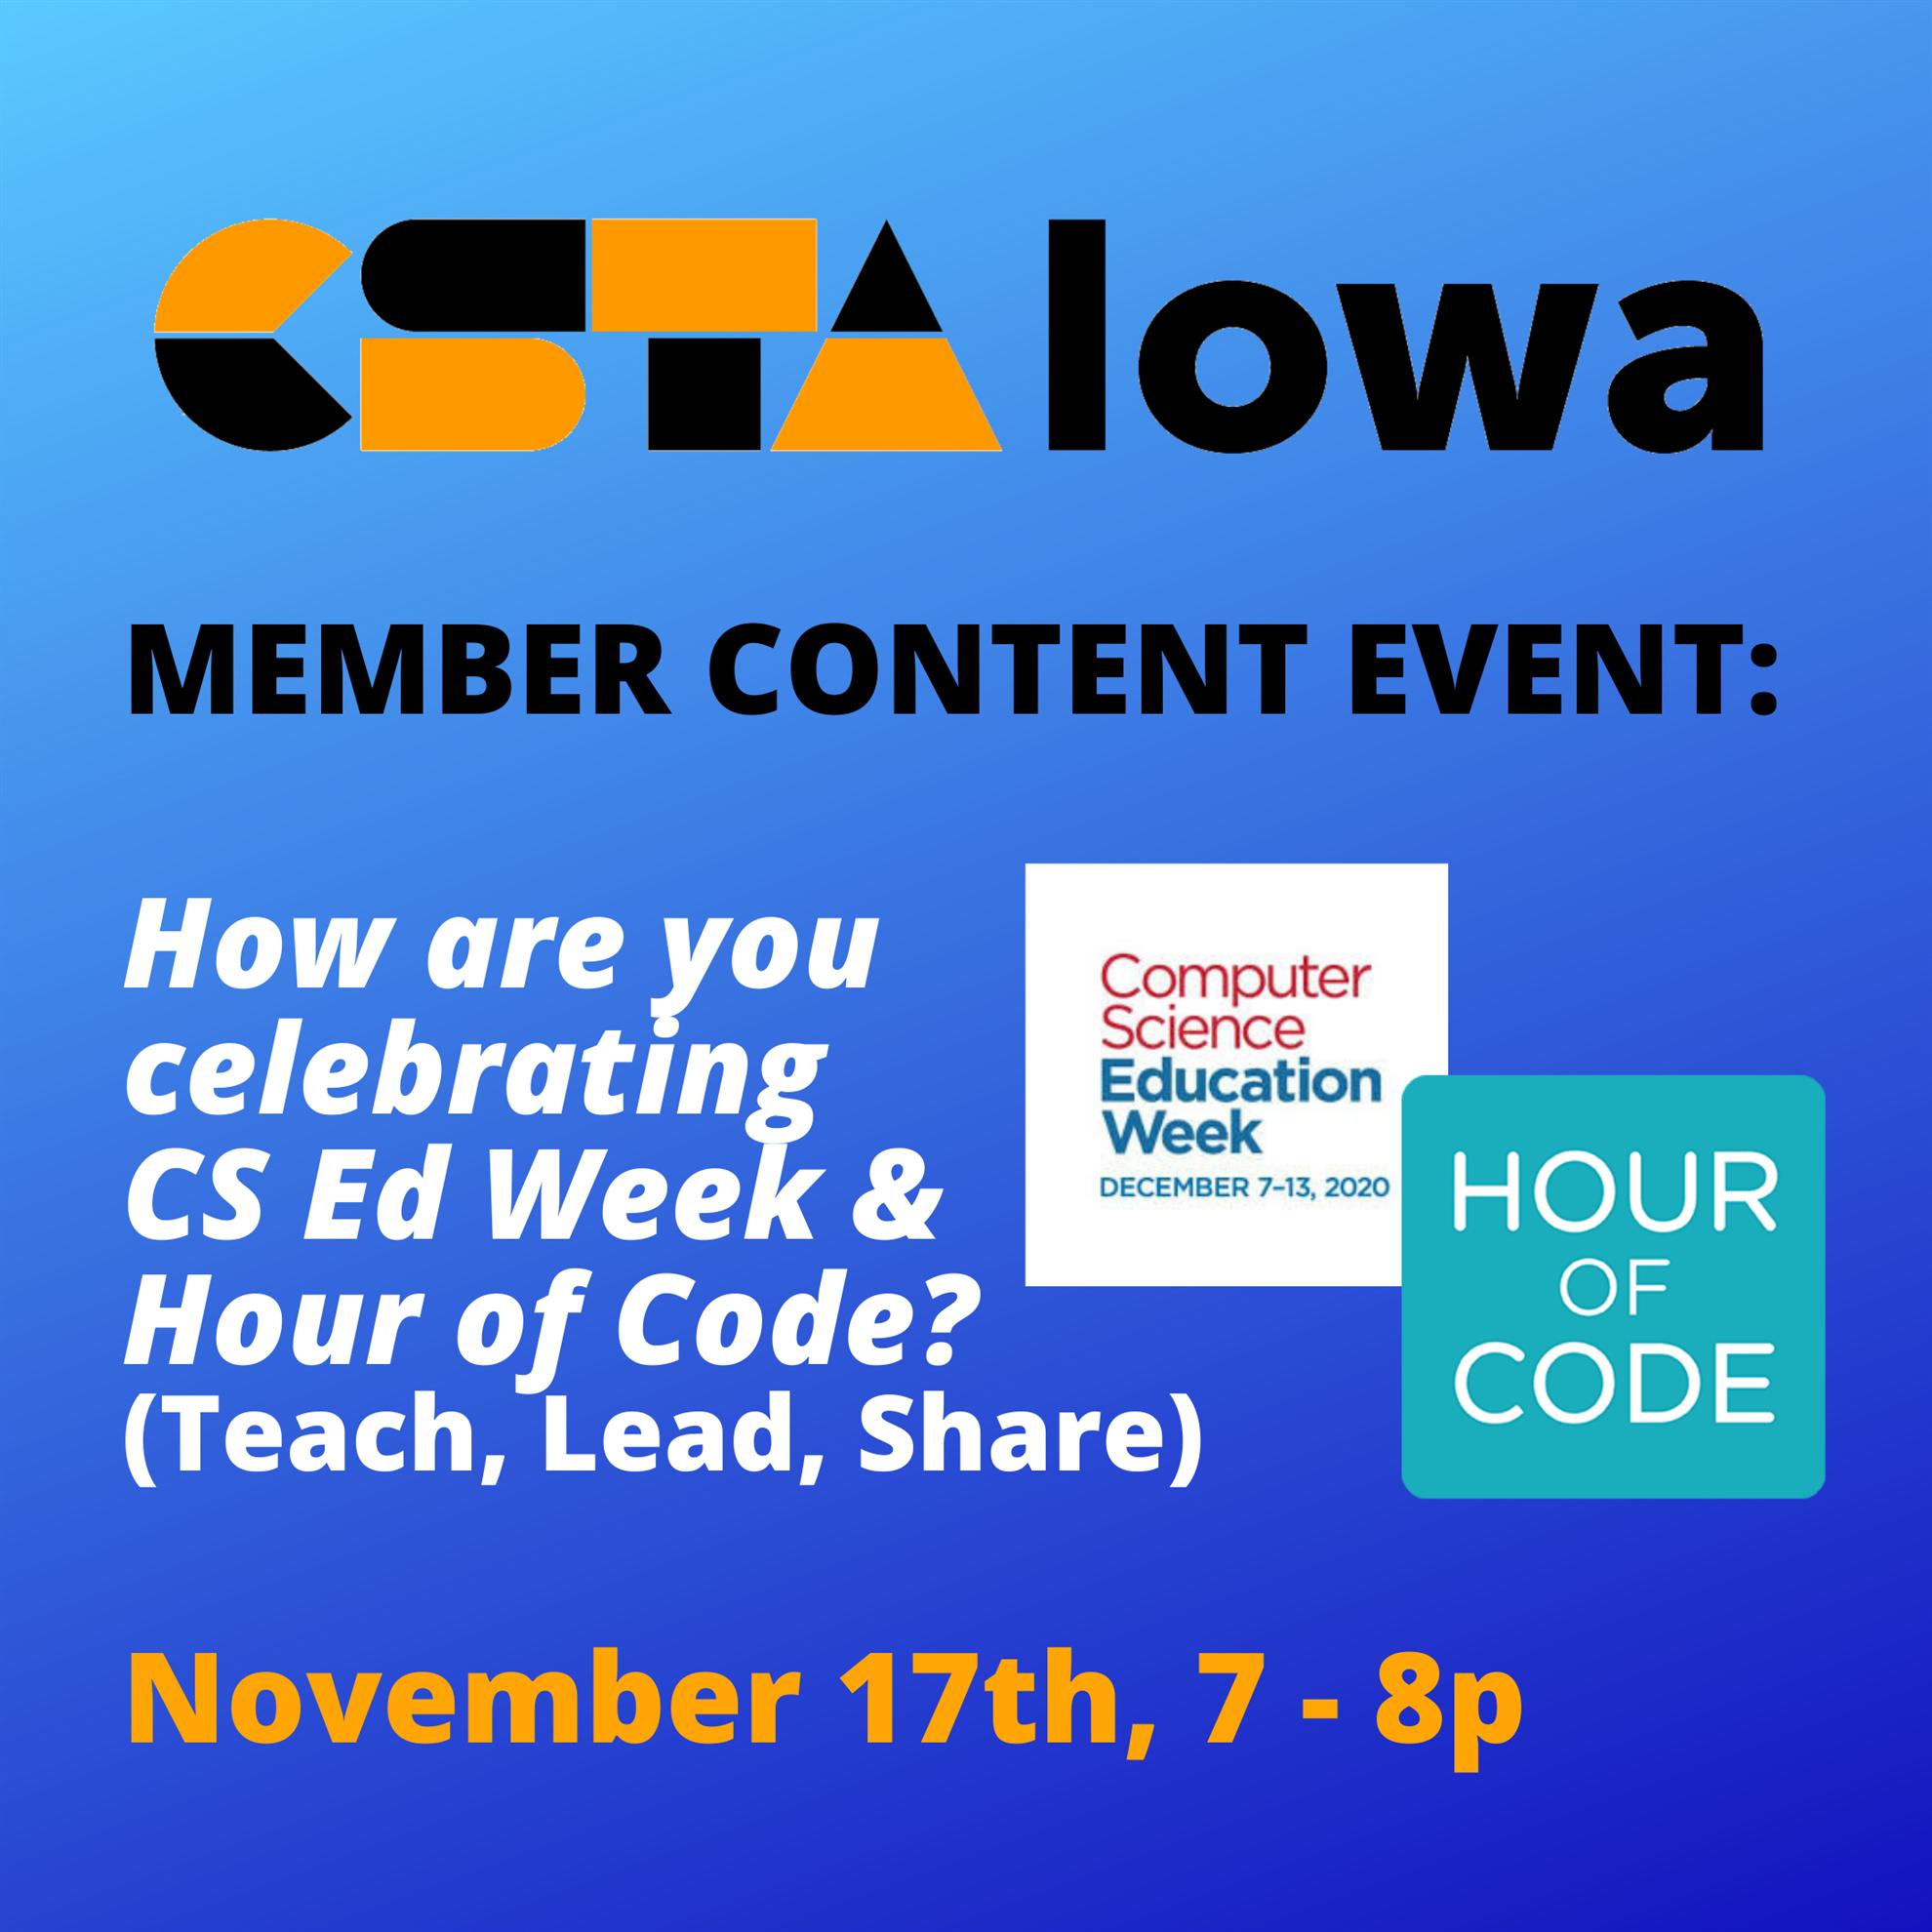 CSTA Iowa Member Meeting - How will you celebrate CSEd Week & Hour of Code?  (CSTA Iowa)